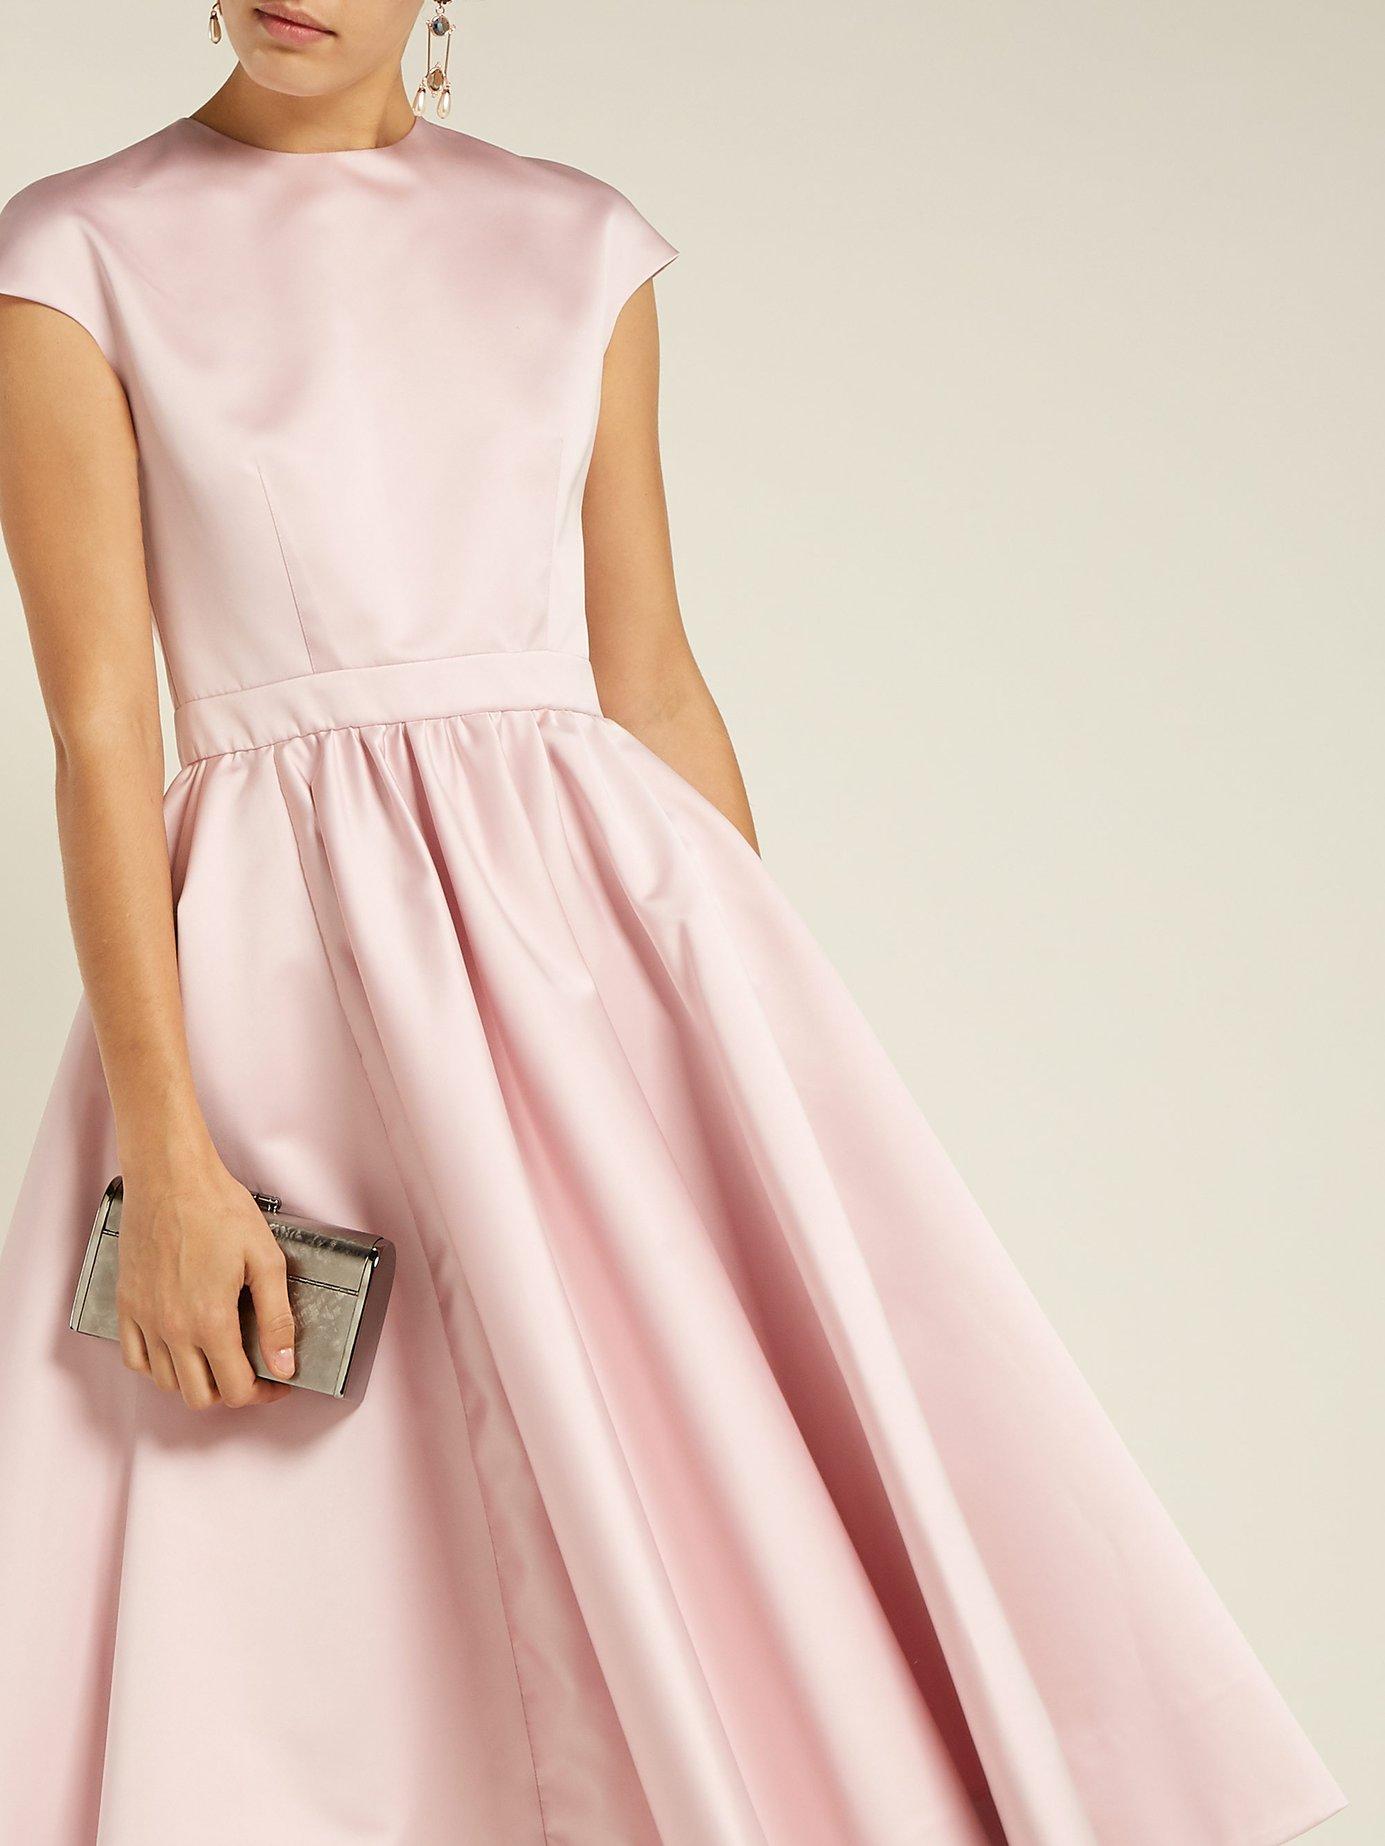 Gathered-waist satin dress by Rochas